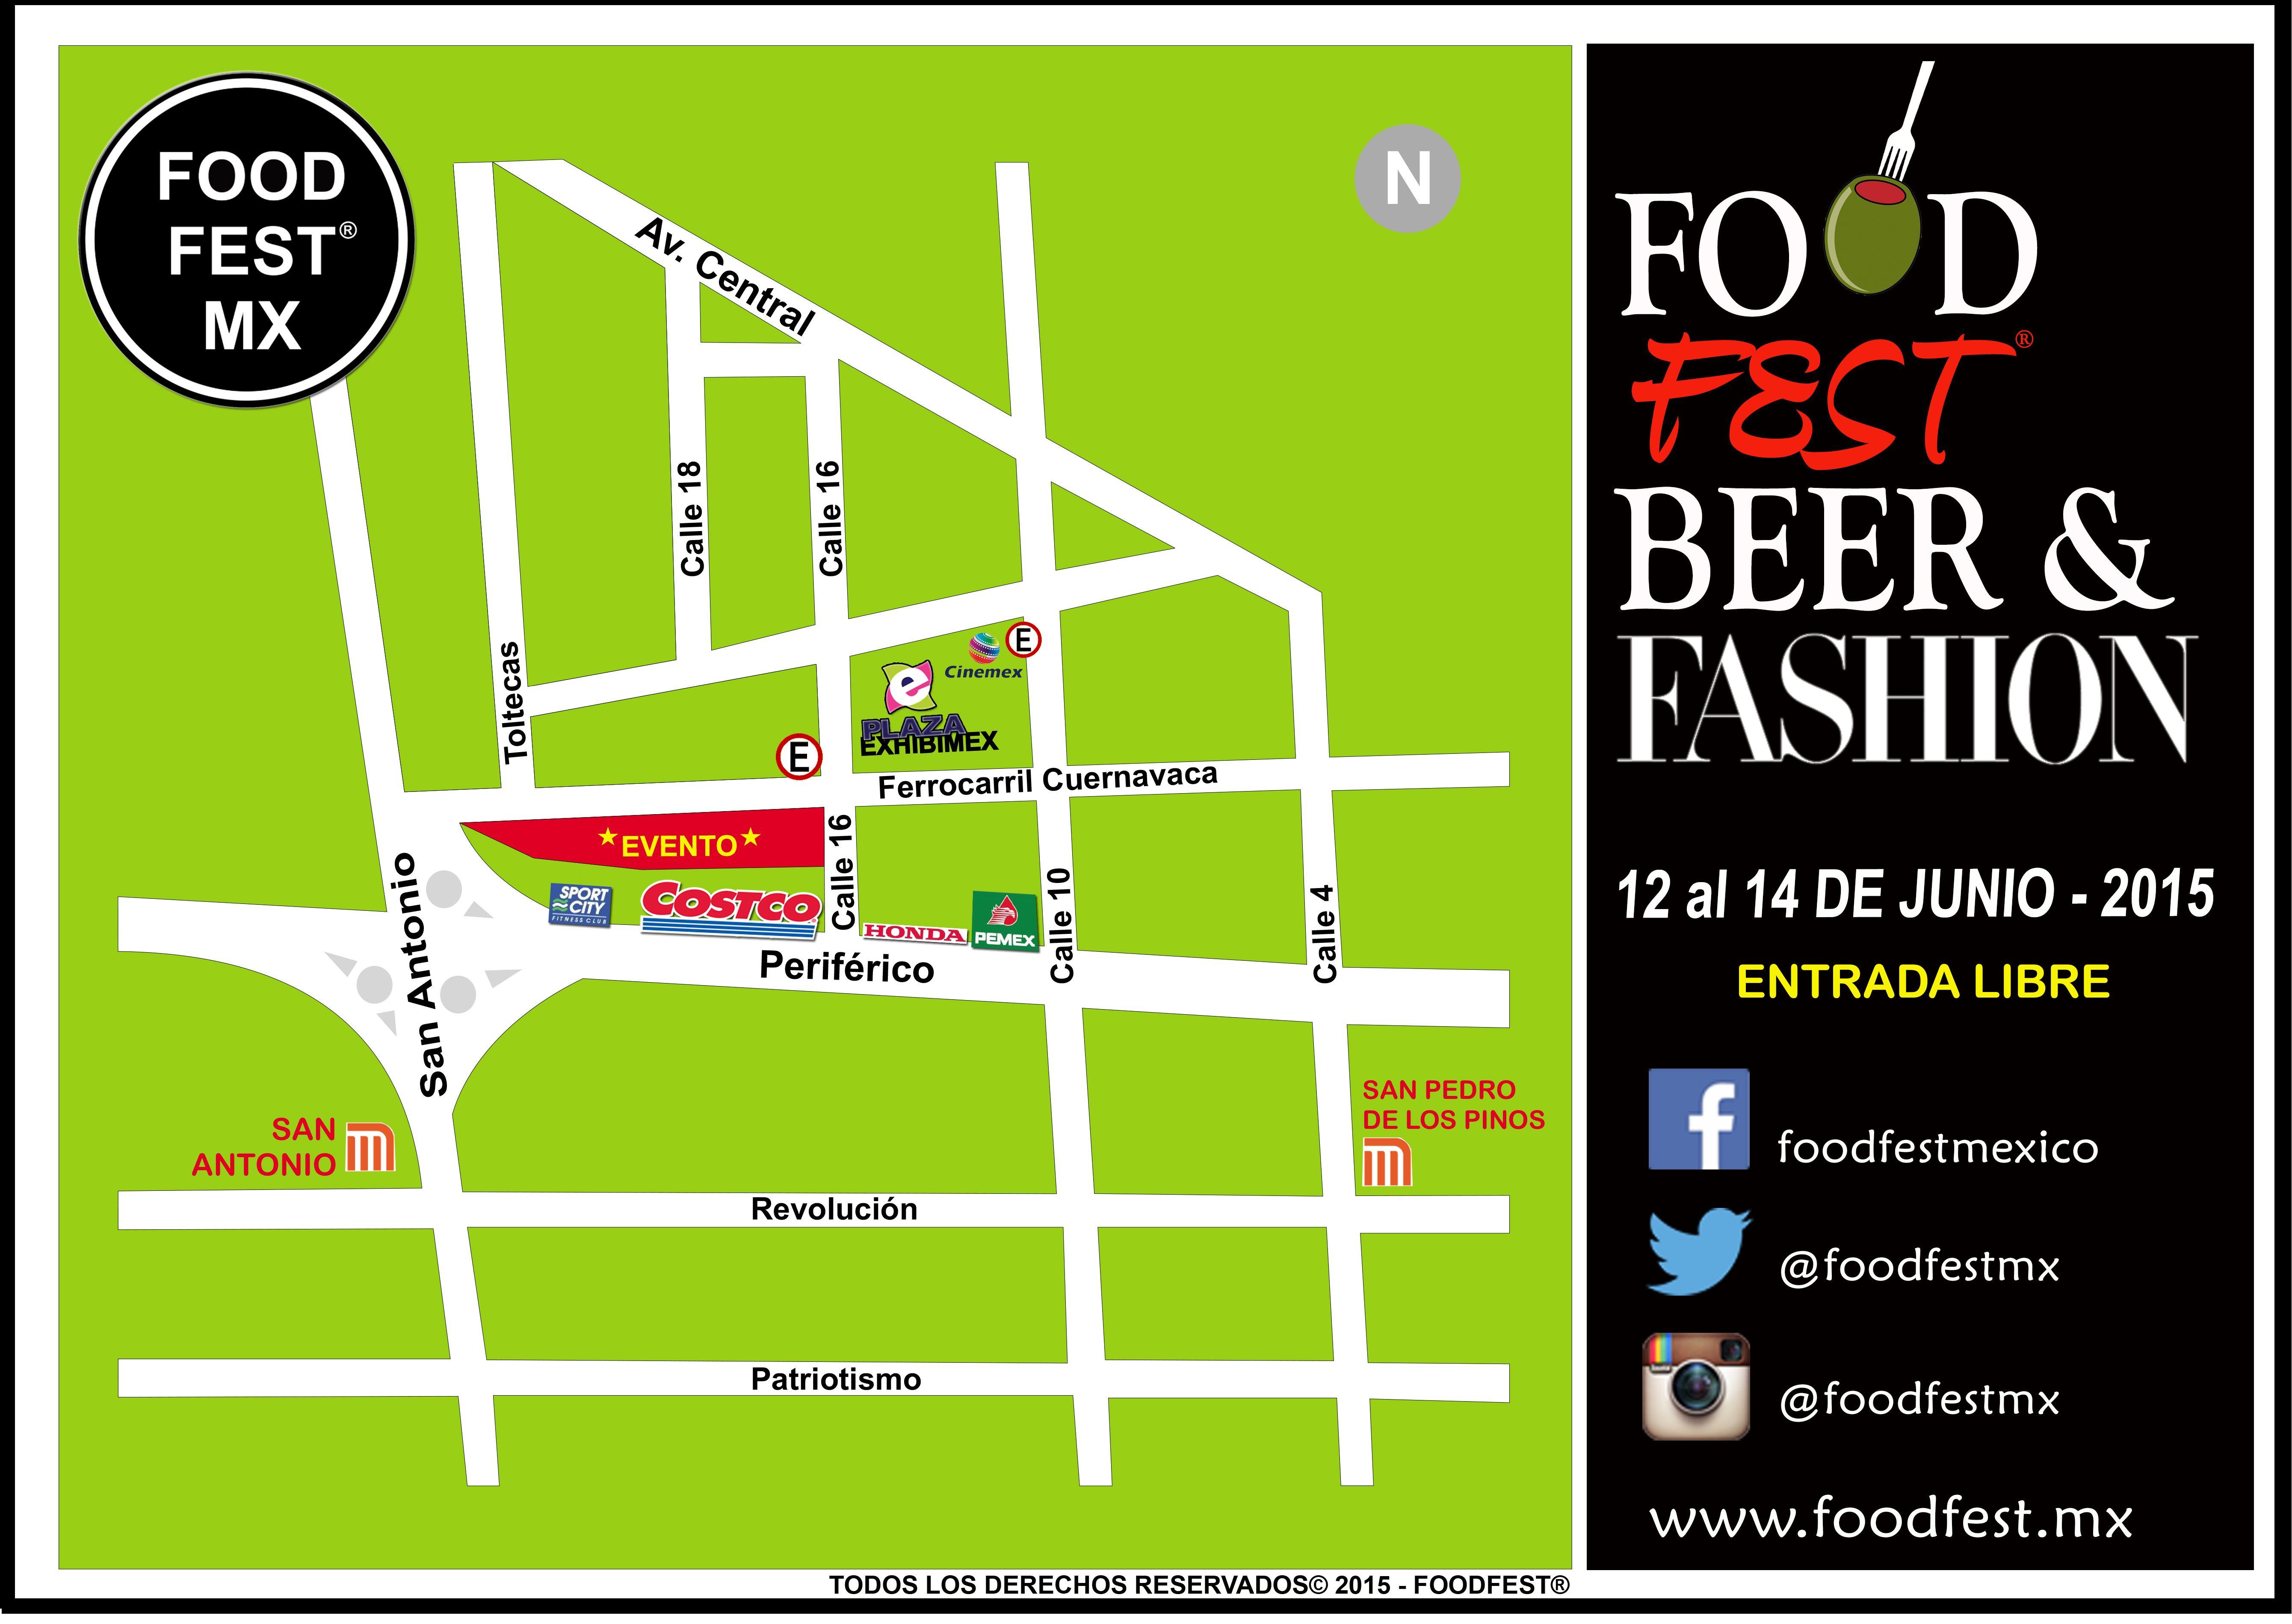 Food Fest (México) Diciembre 2015